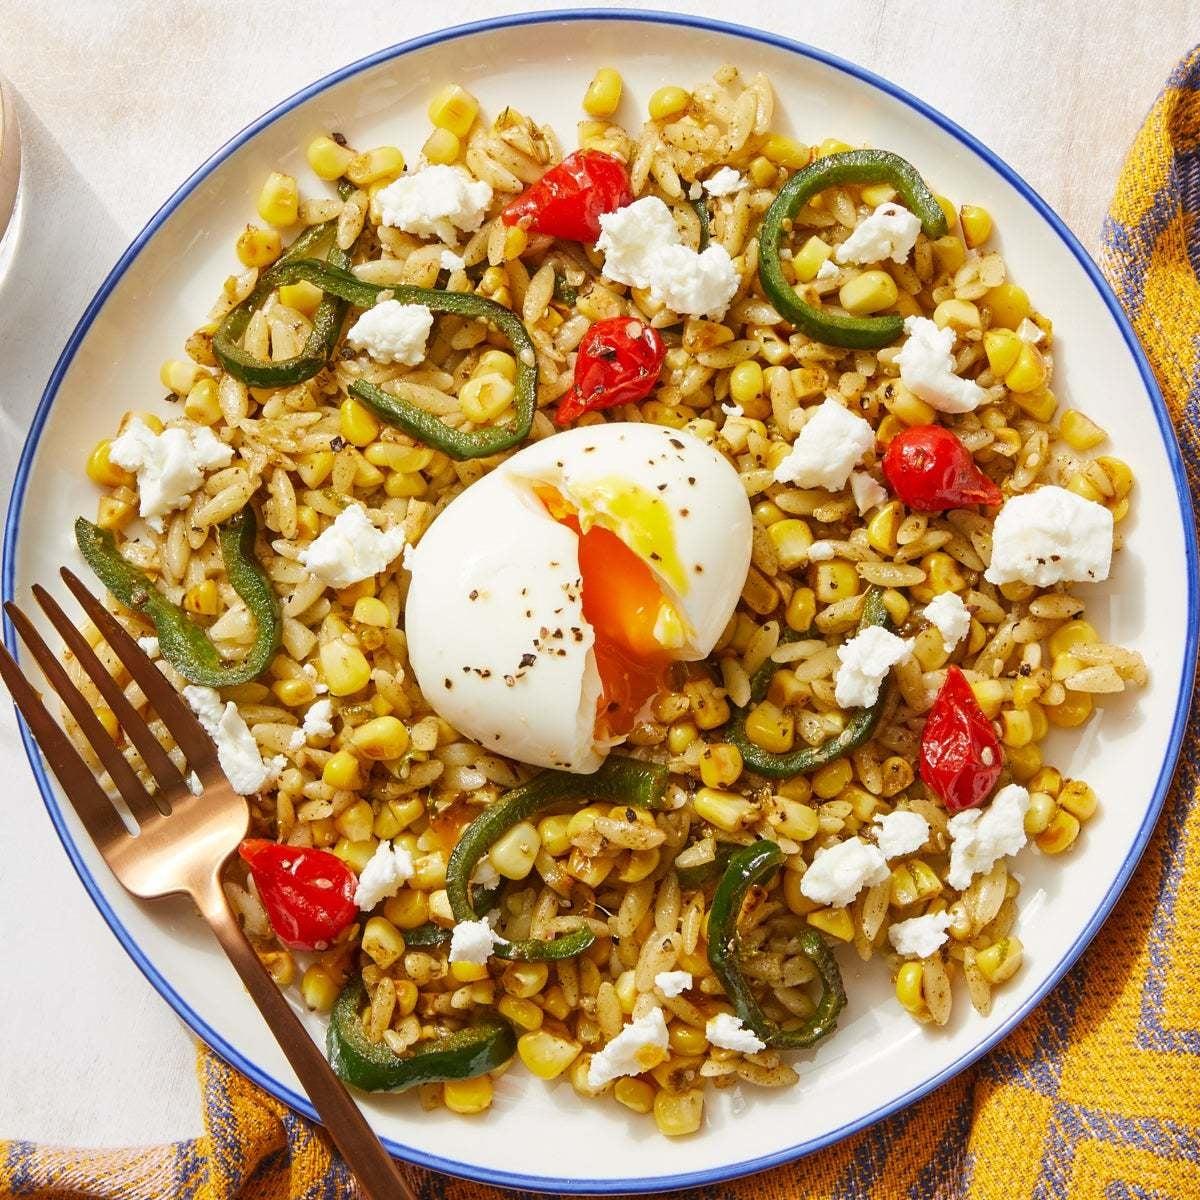 Za'atar Vegetable & Orzo Salad with Soft-Boiled Eggs & Feta